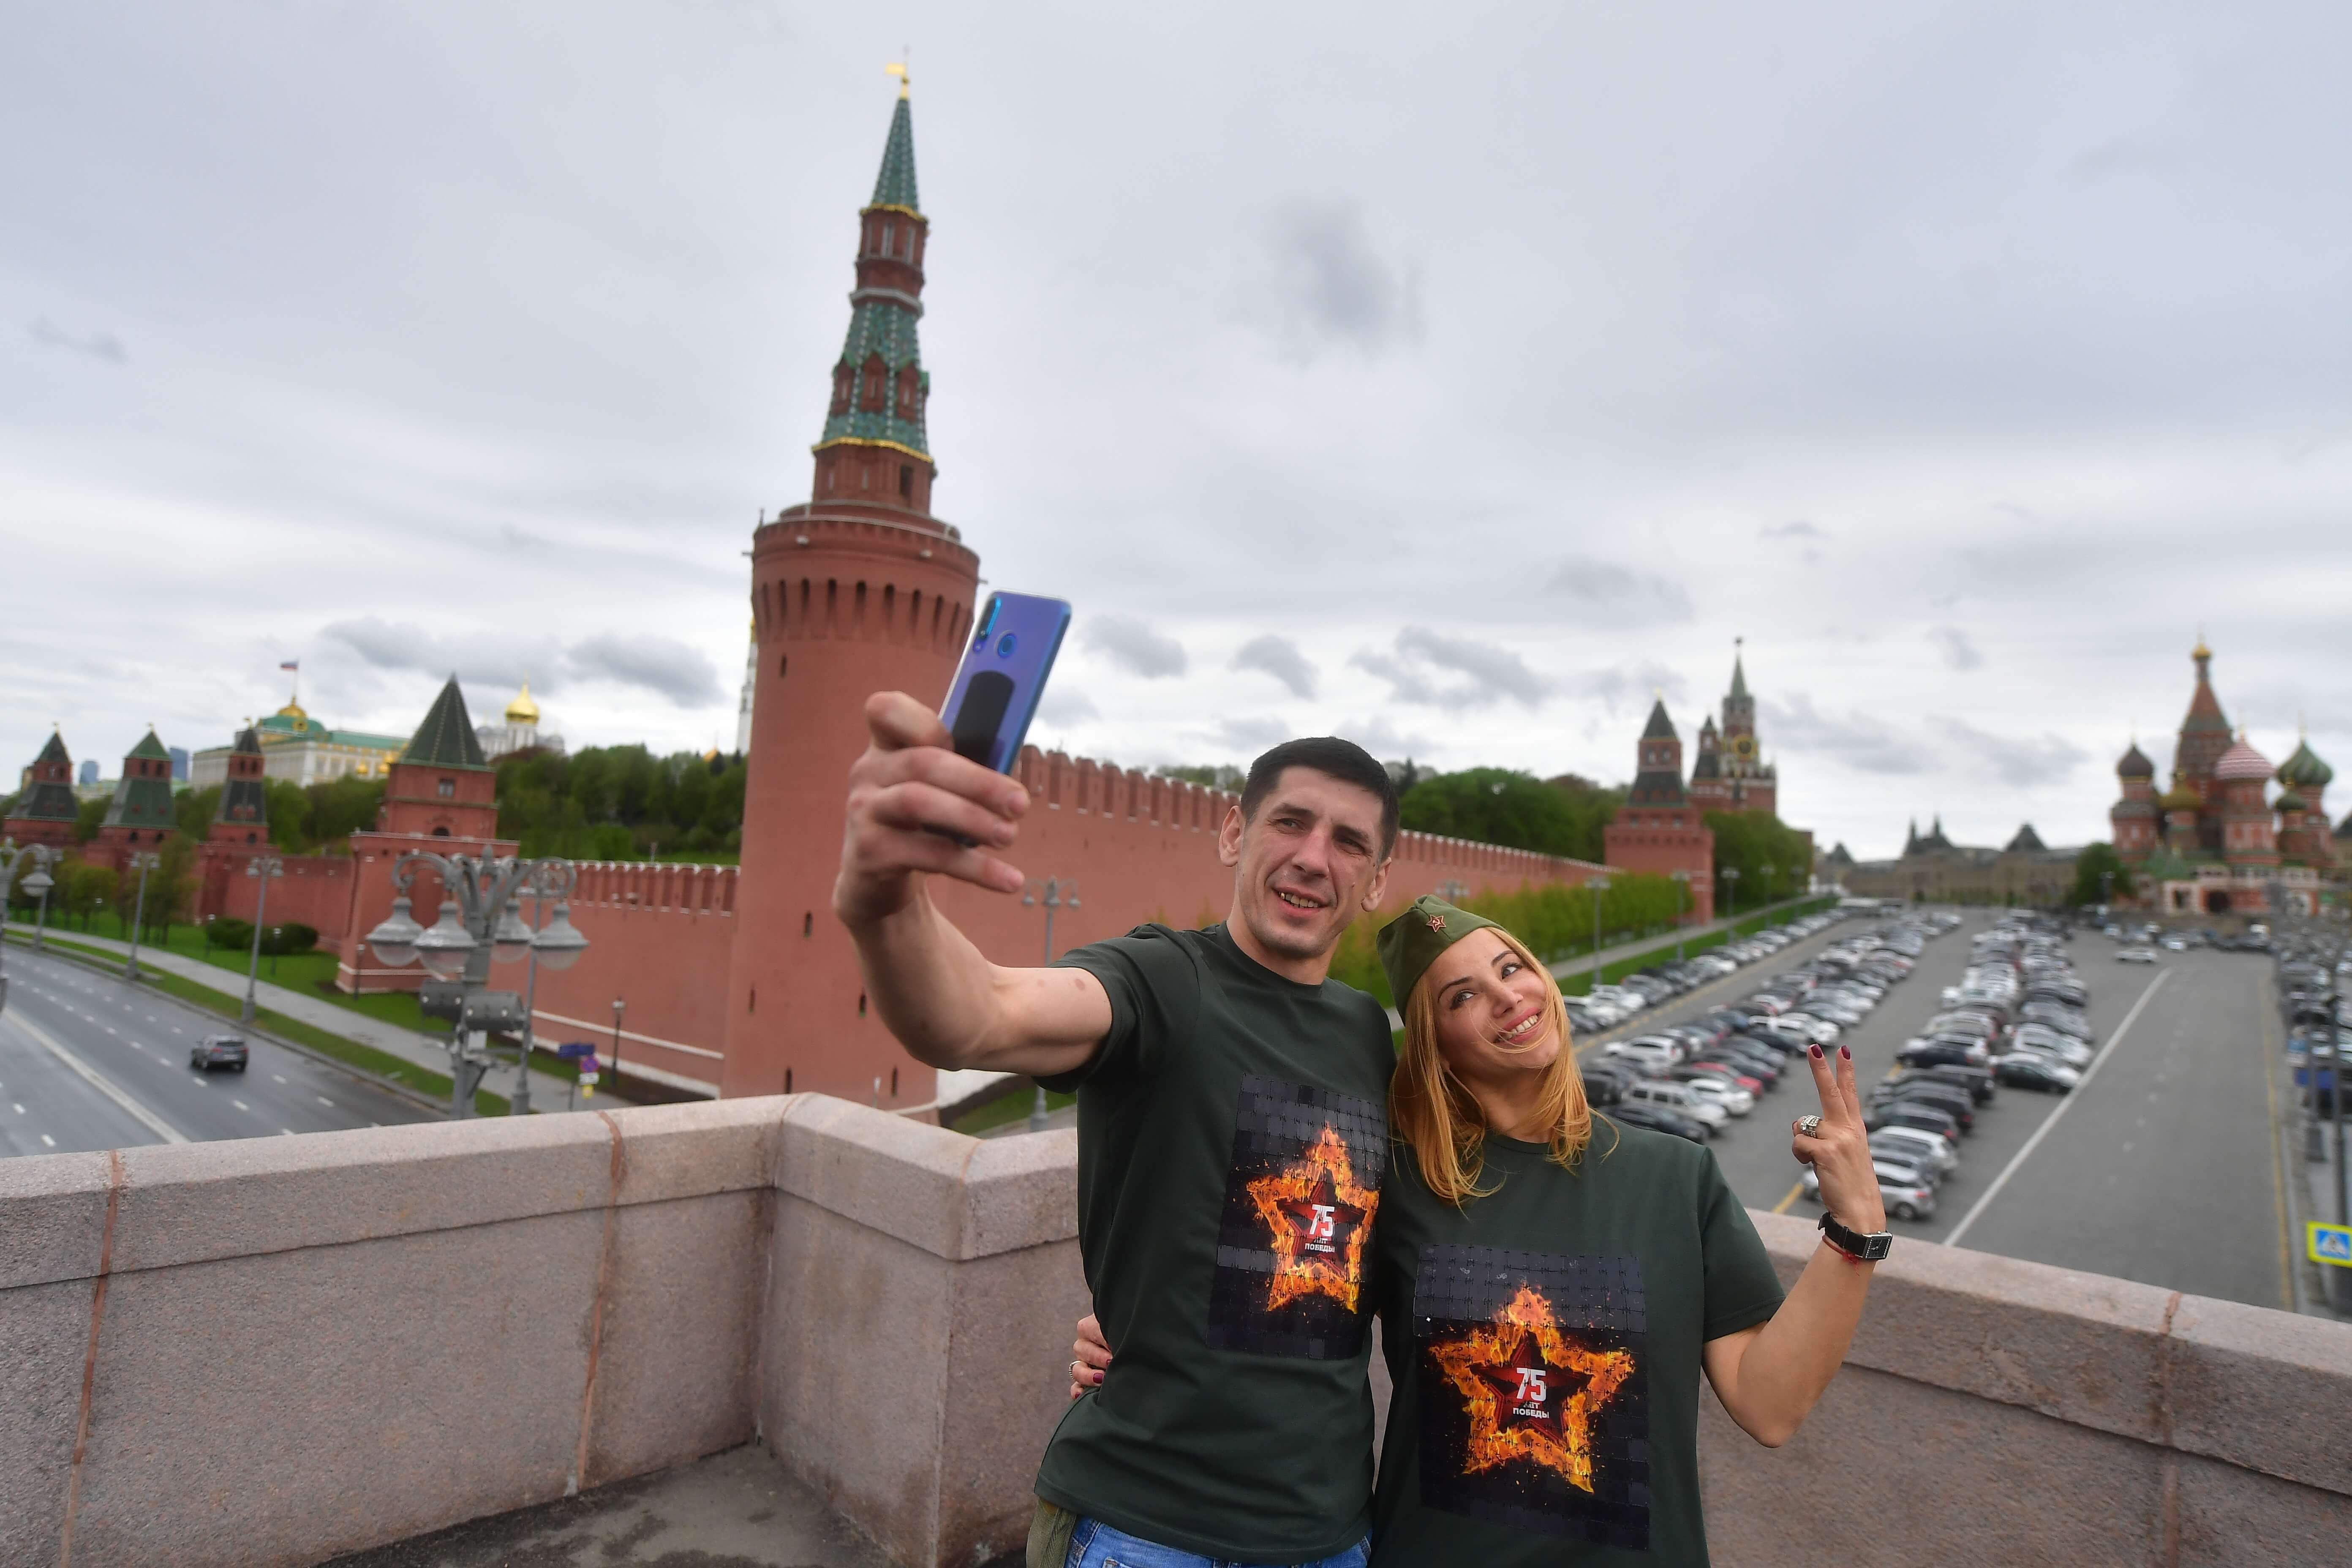 Komsomolskaya Pravda/Globallookpress.com